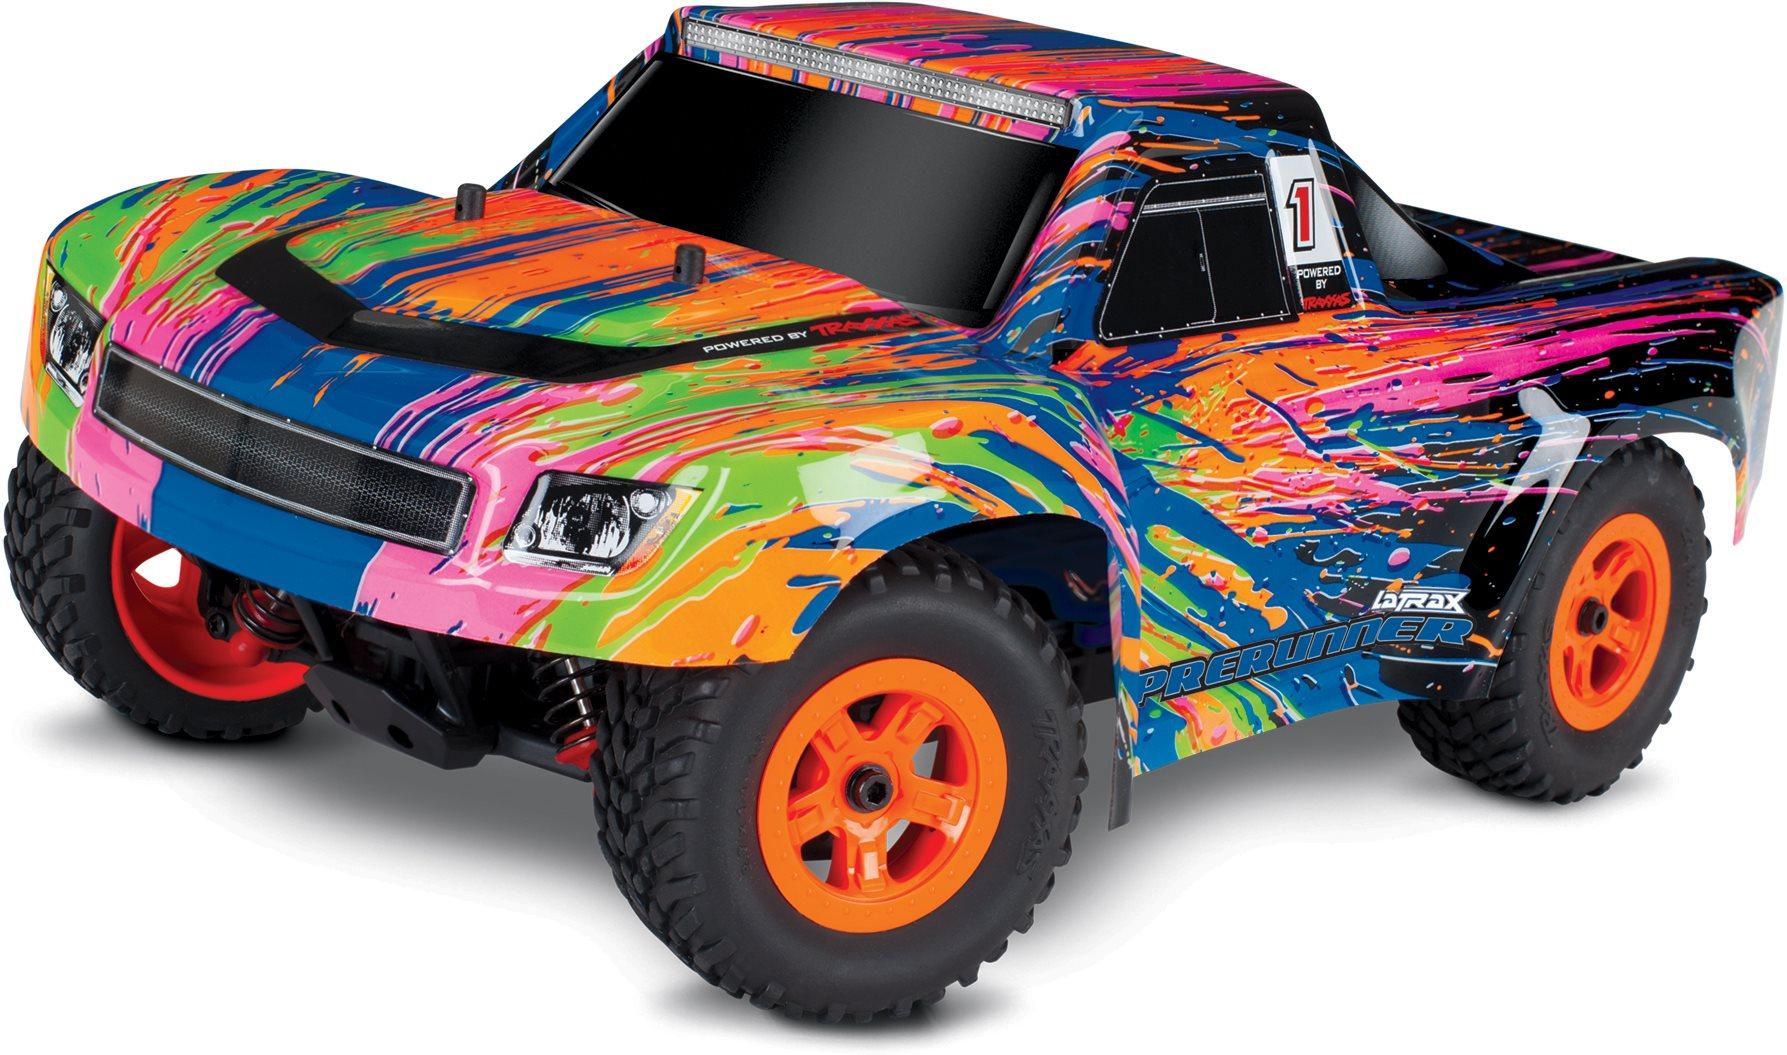 Traxxas LaTrax 1/18 Desert Prerunner 4WD RTR, w/ 2.4GHz Radio, AC Charge